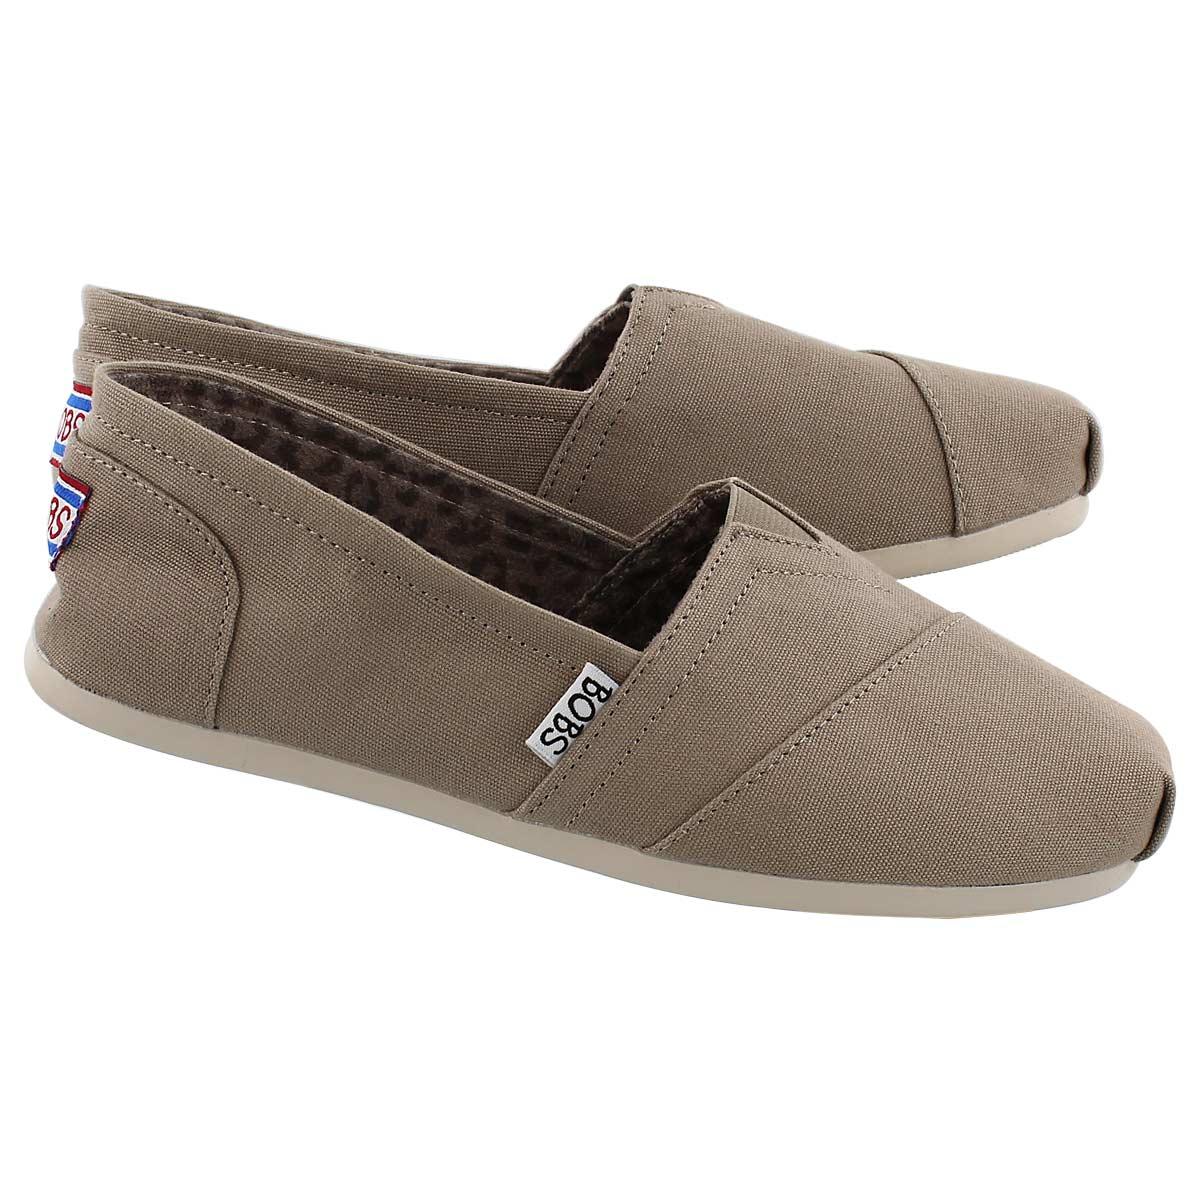 Women's Bobs Plush Peace & Love Shoe - Taupe